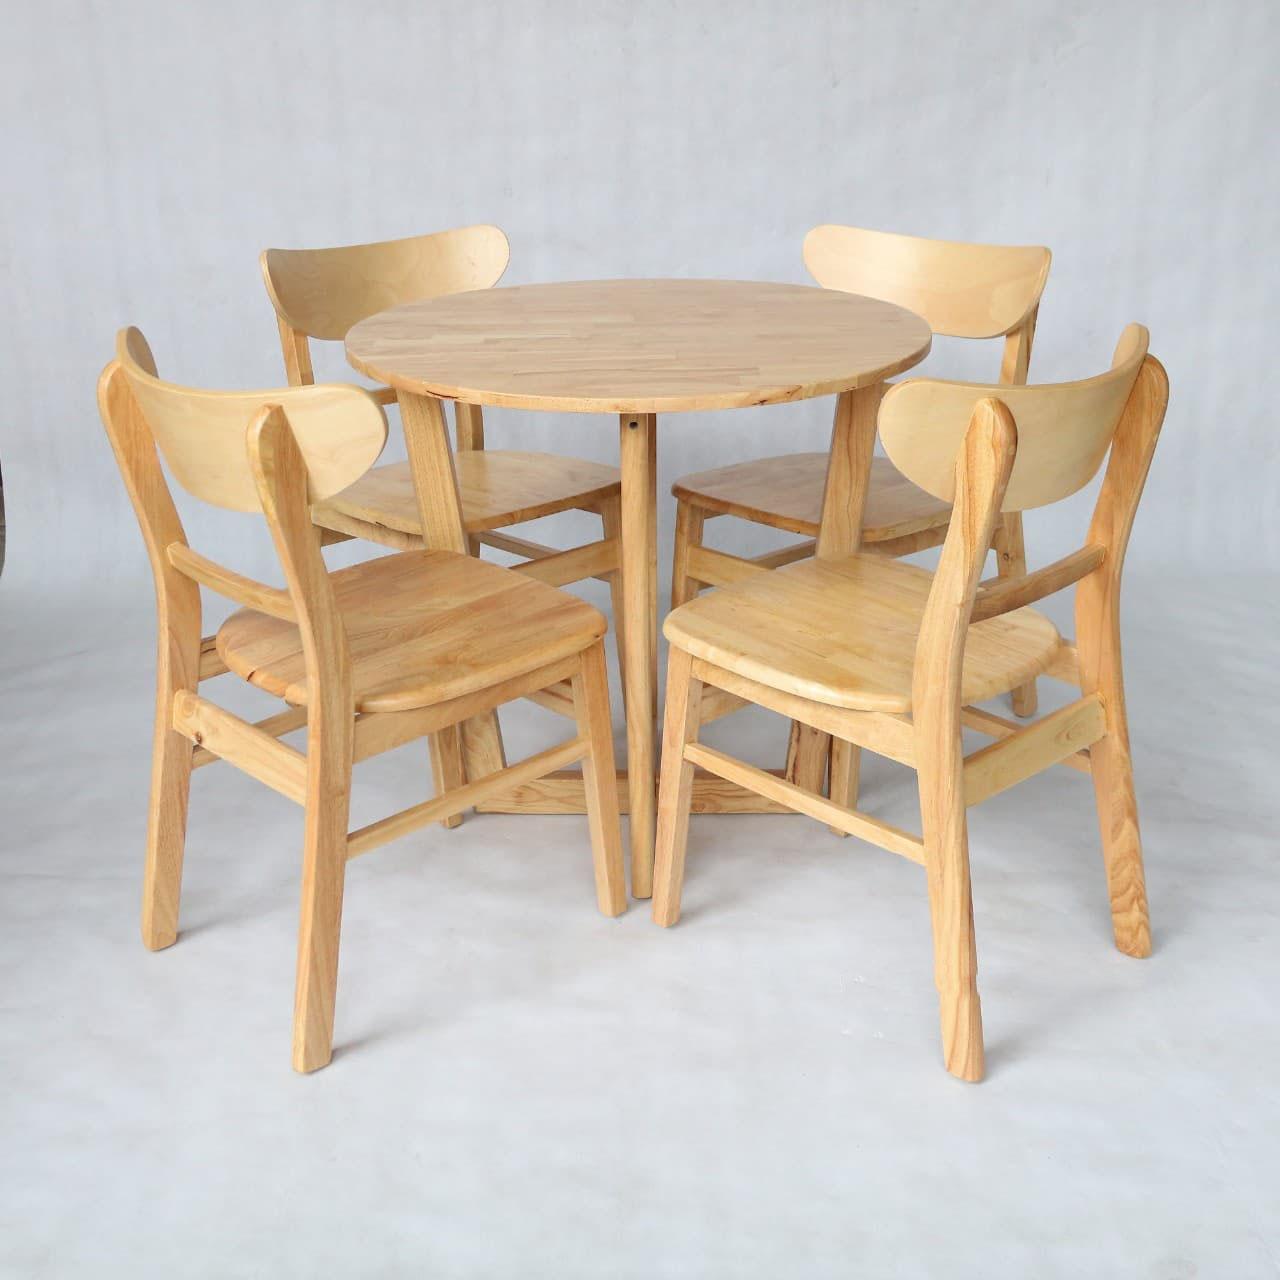 Bộ bàn ăn Mango 4 ghế gỗ tự nhiên